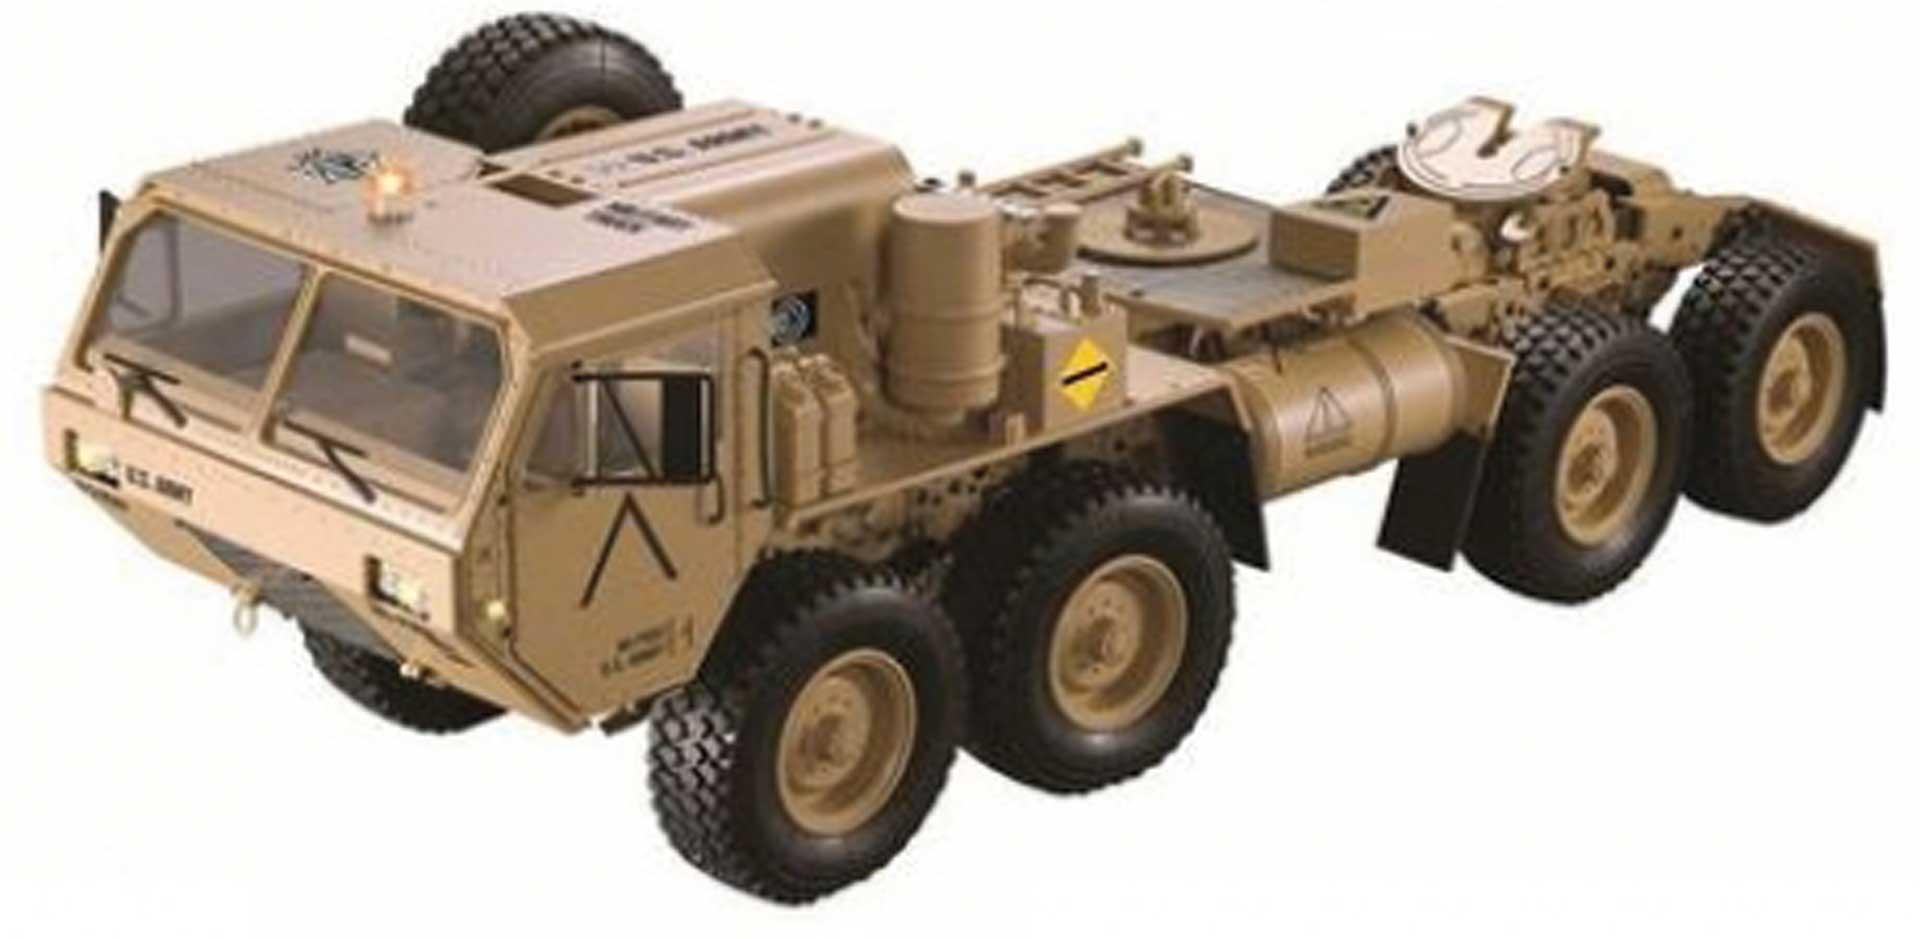 FM-ELECTRICS XL Military Truck 1/10 Zugmaschine 8X8 Allrad